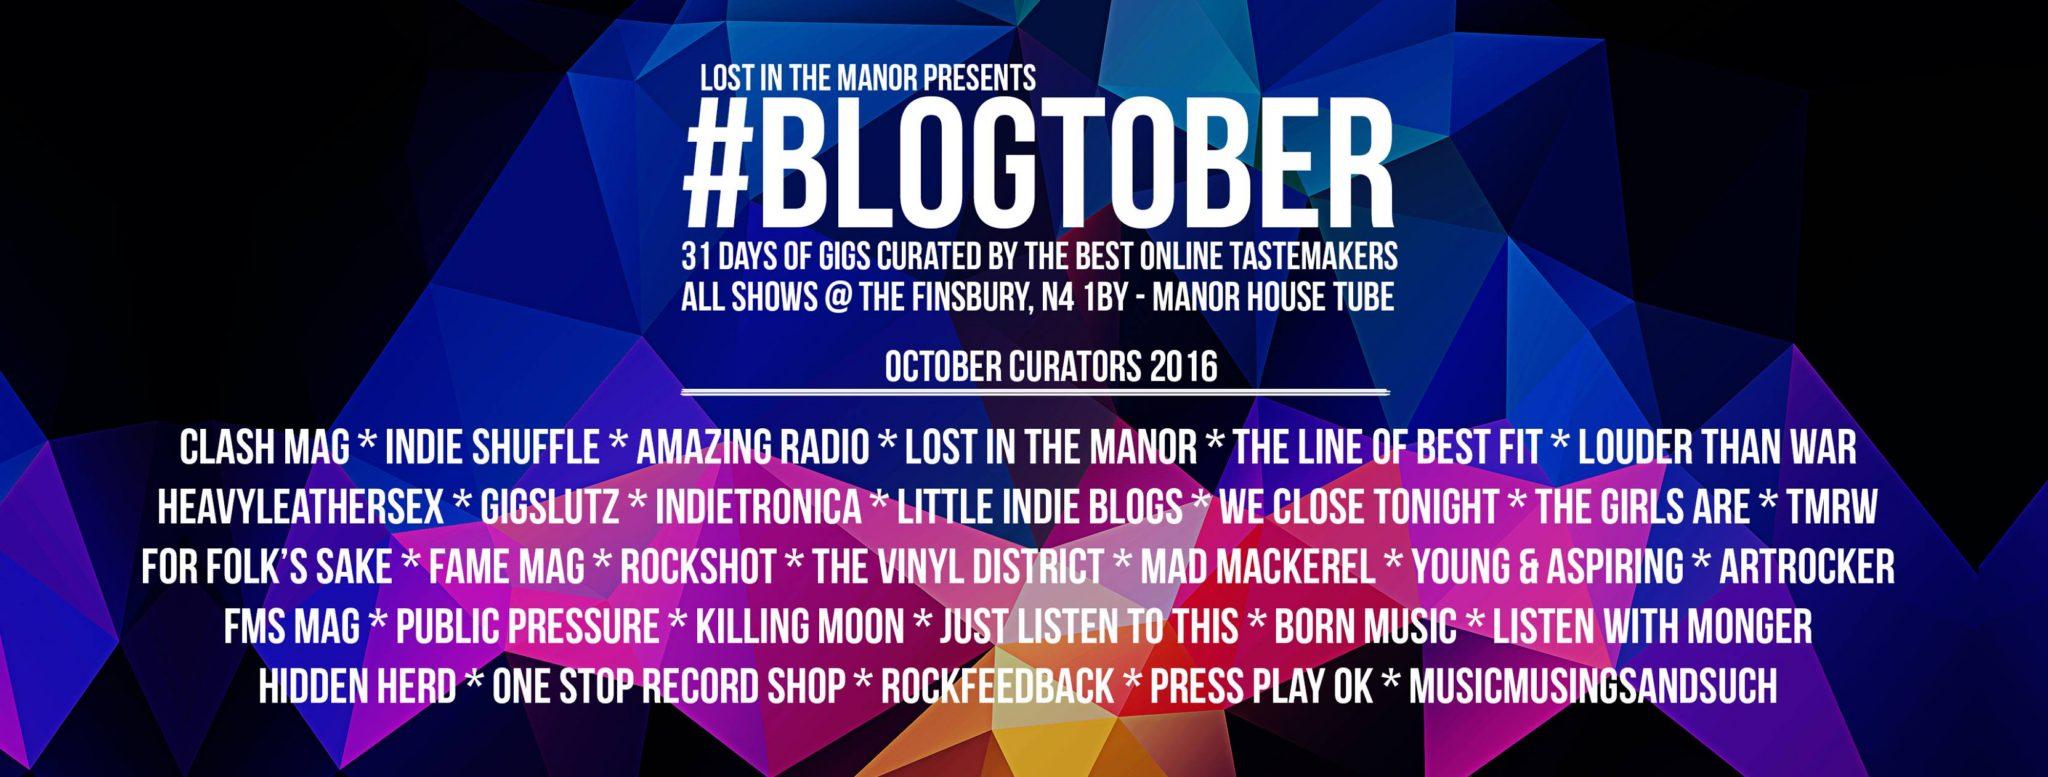 Uk Music Blogs Indie